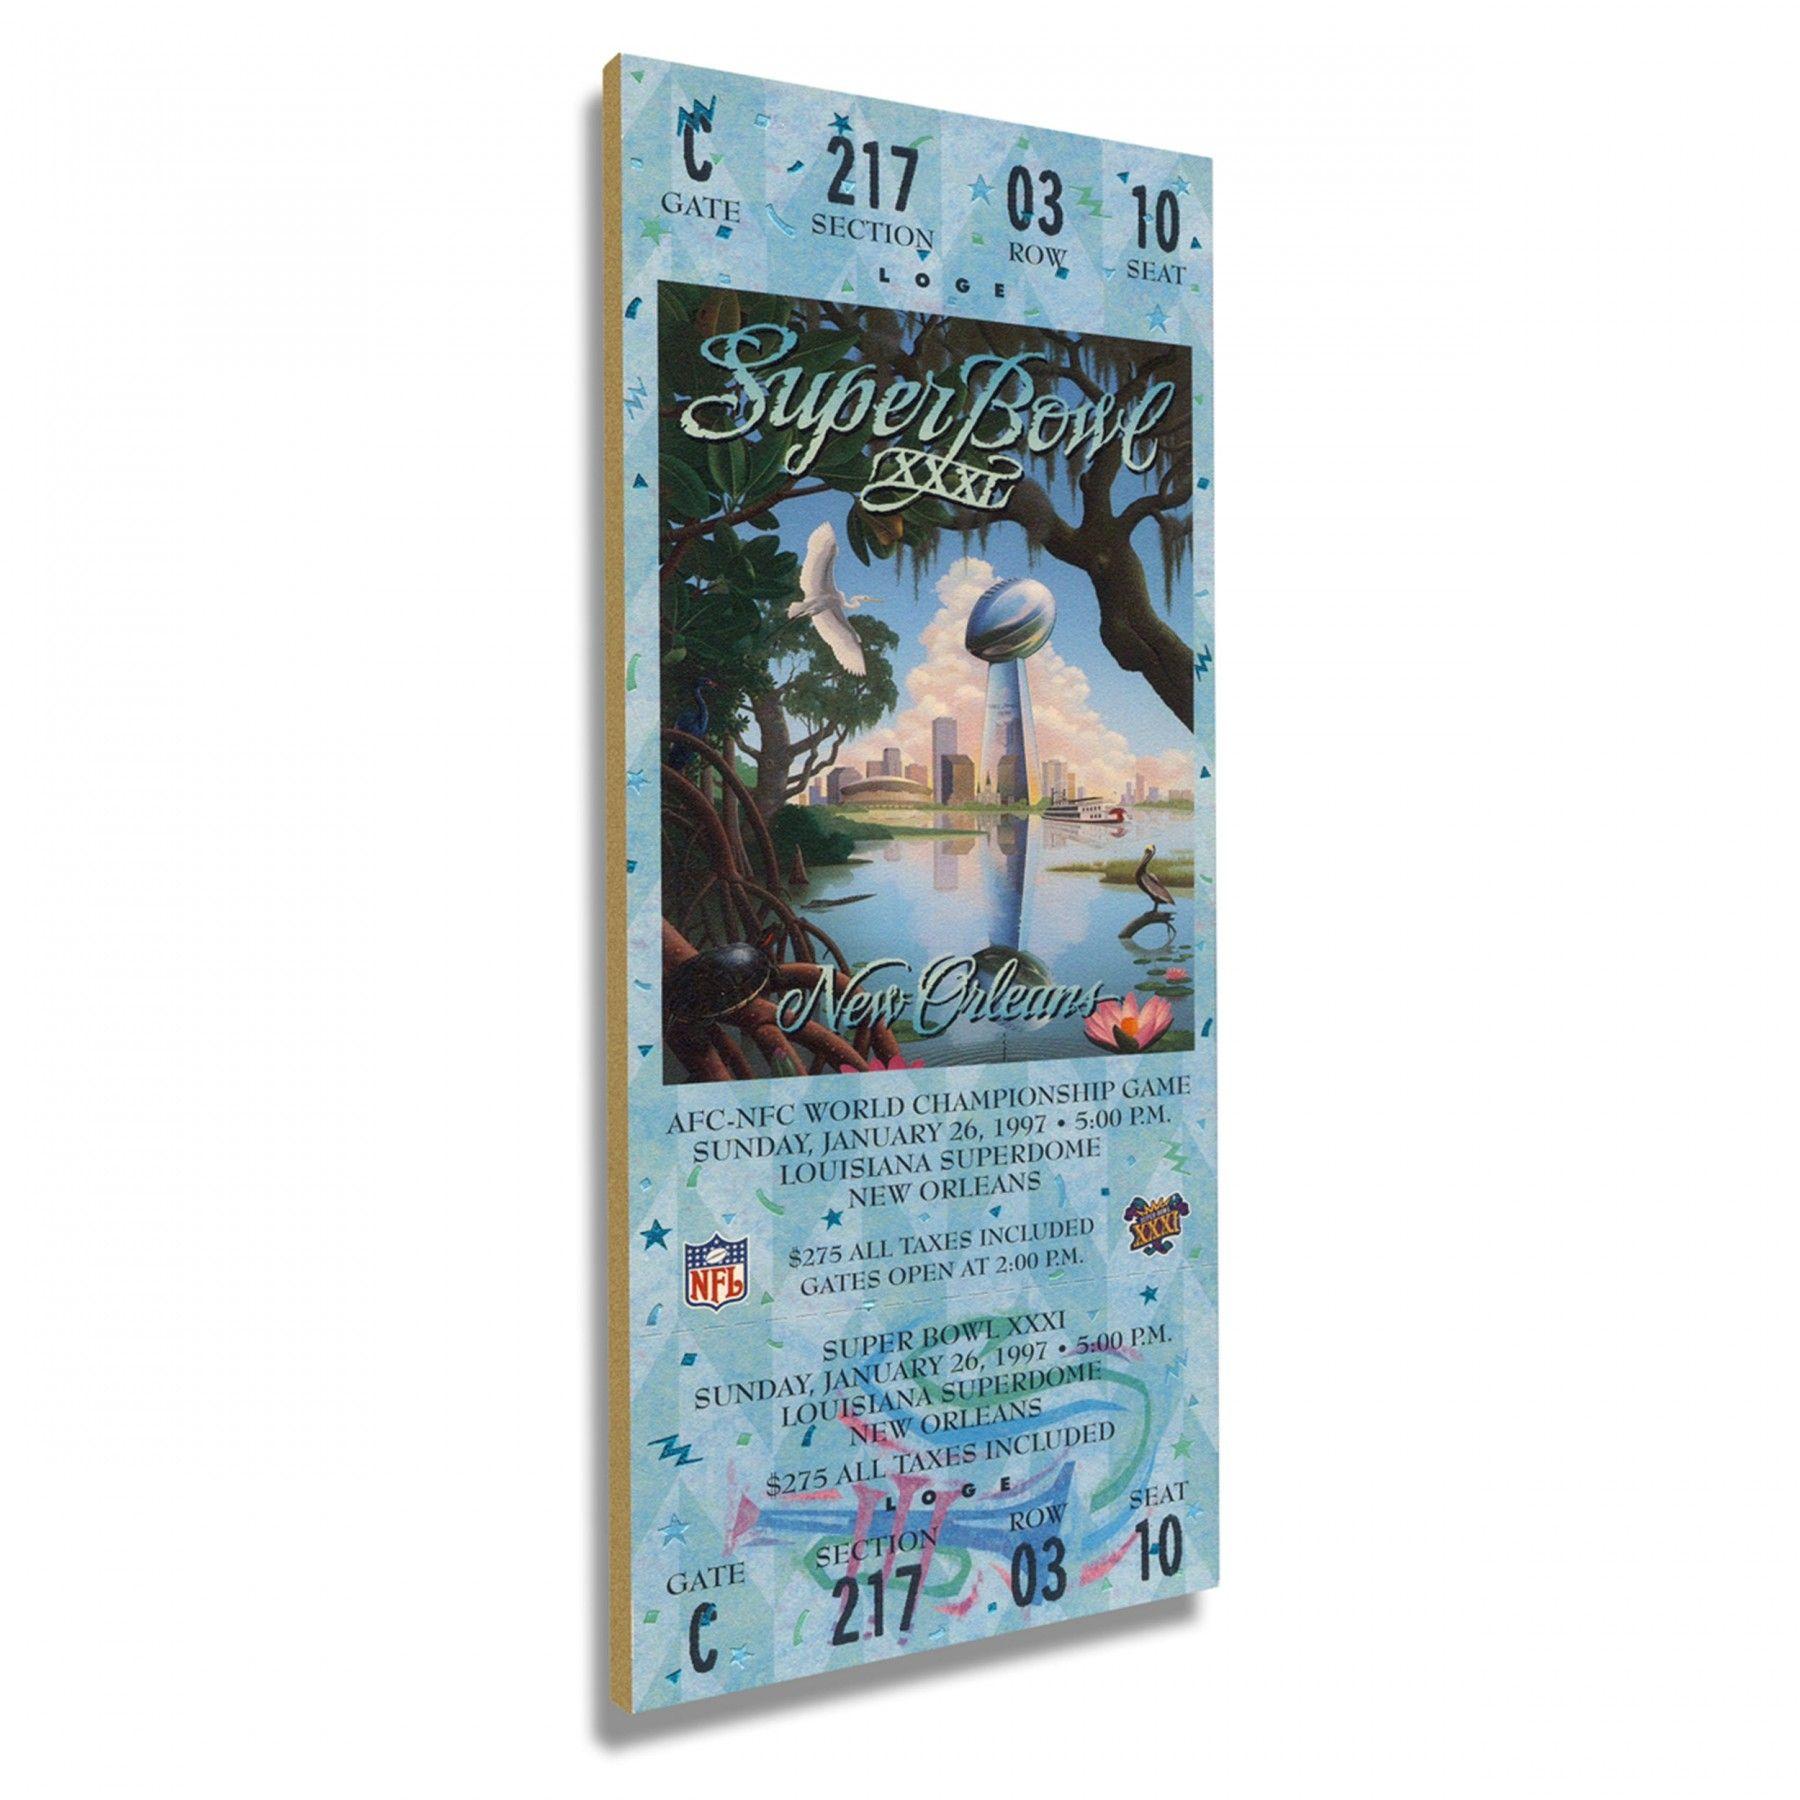 Green Bay Packers Super Bowl XXXI Mega Wood Ticket Plaque at the